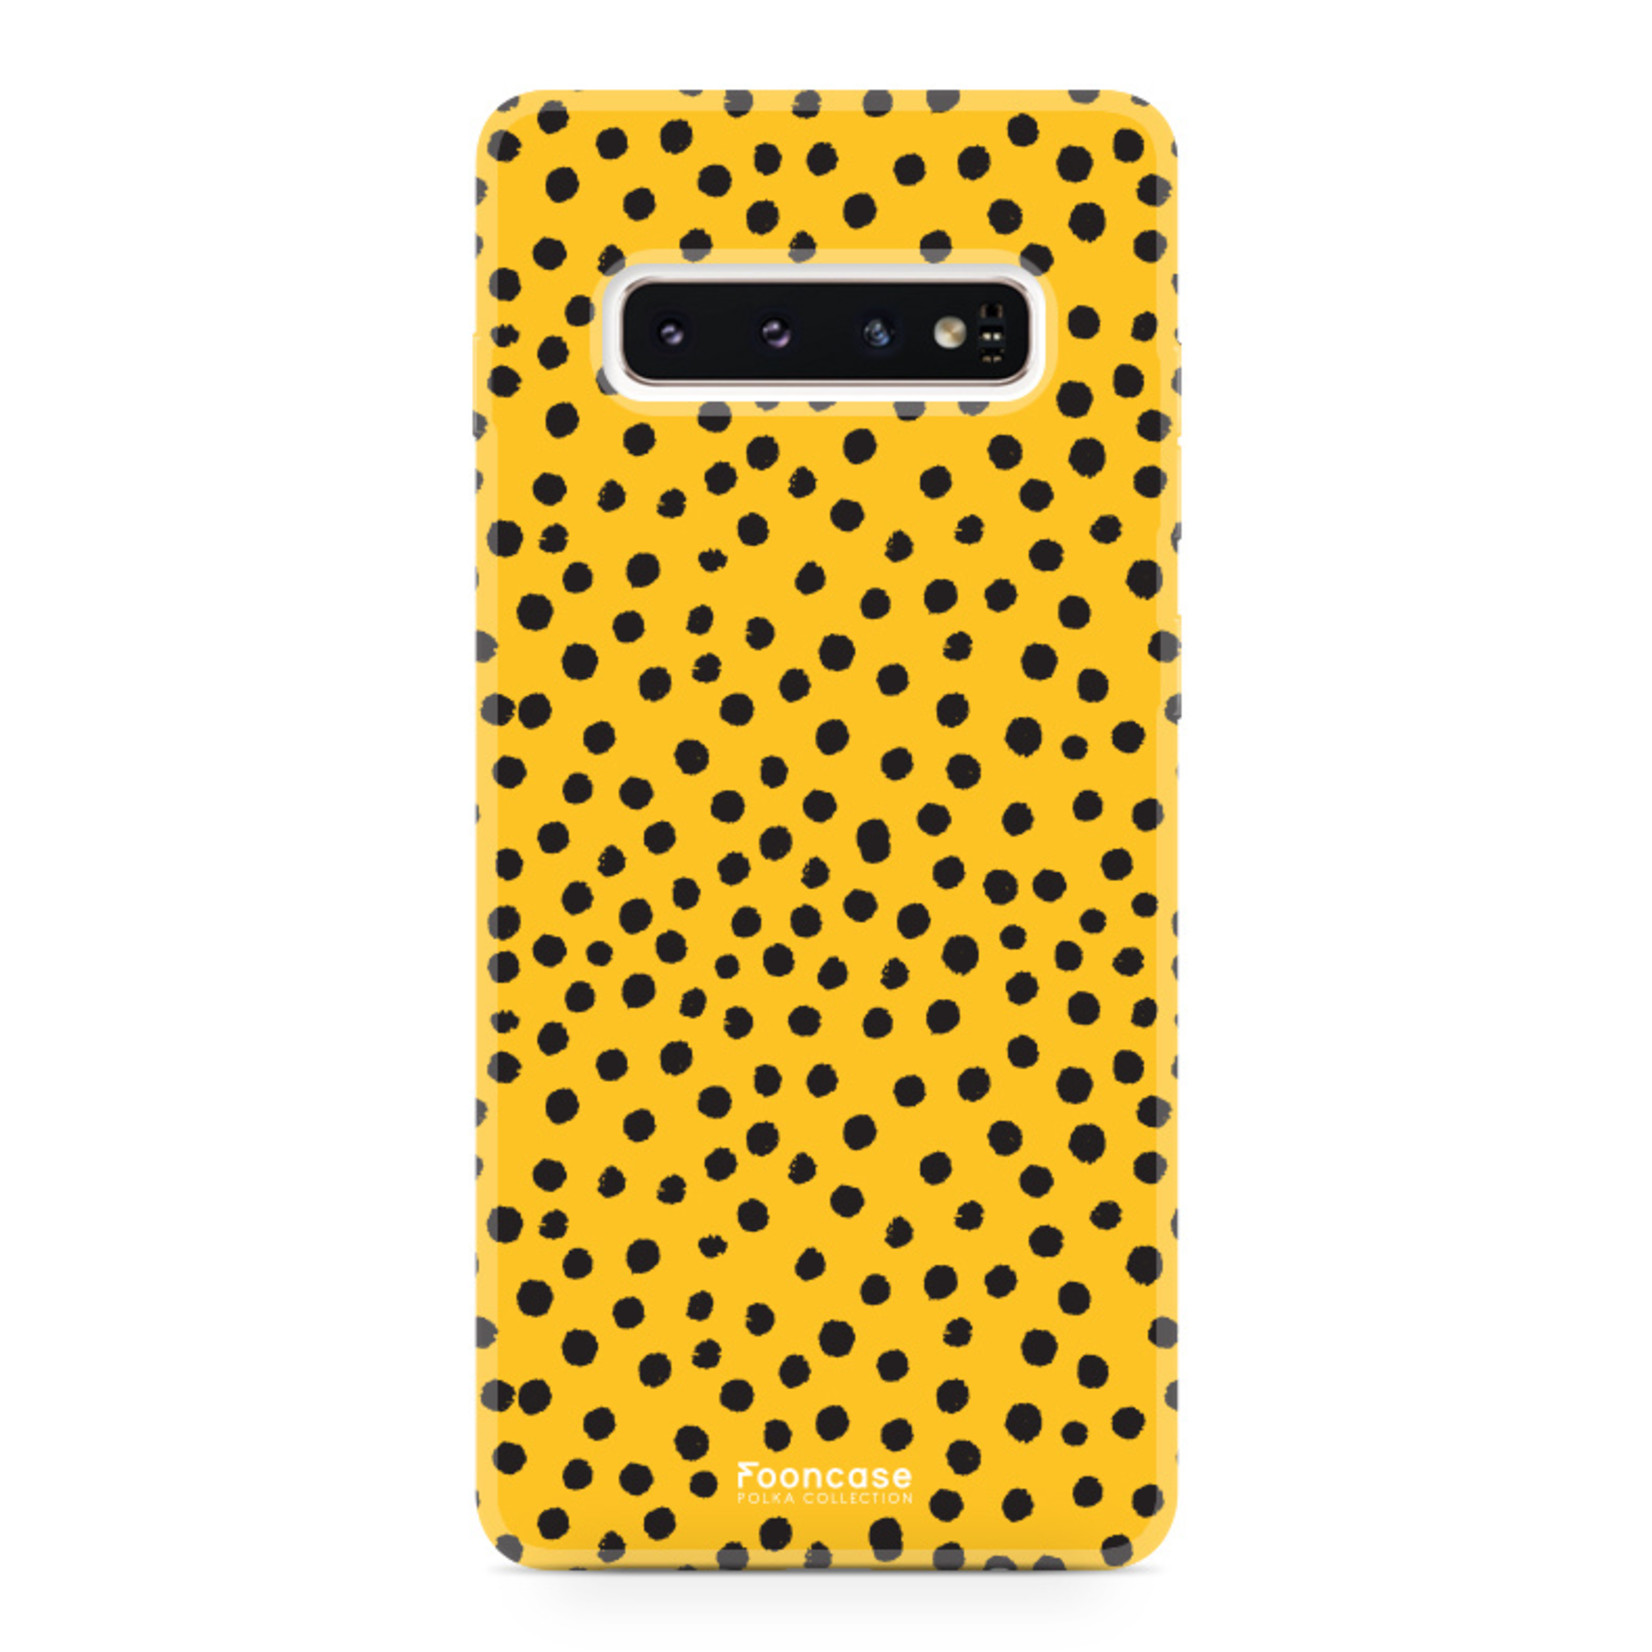 FOONCASE Samsung Galaxy S10 Plus hoesje TPU Soft Case - Back Cover - POLKA COLLECTION / Stipjes / Stippen / Oker Geel